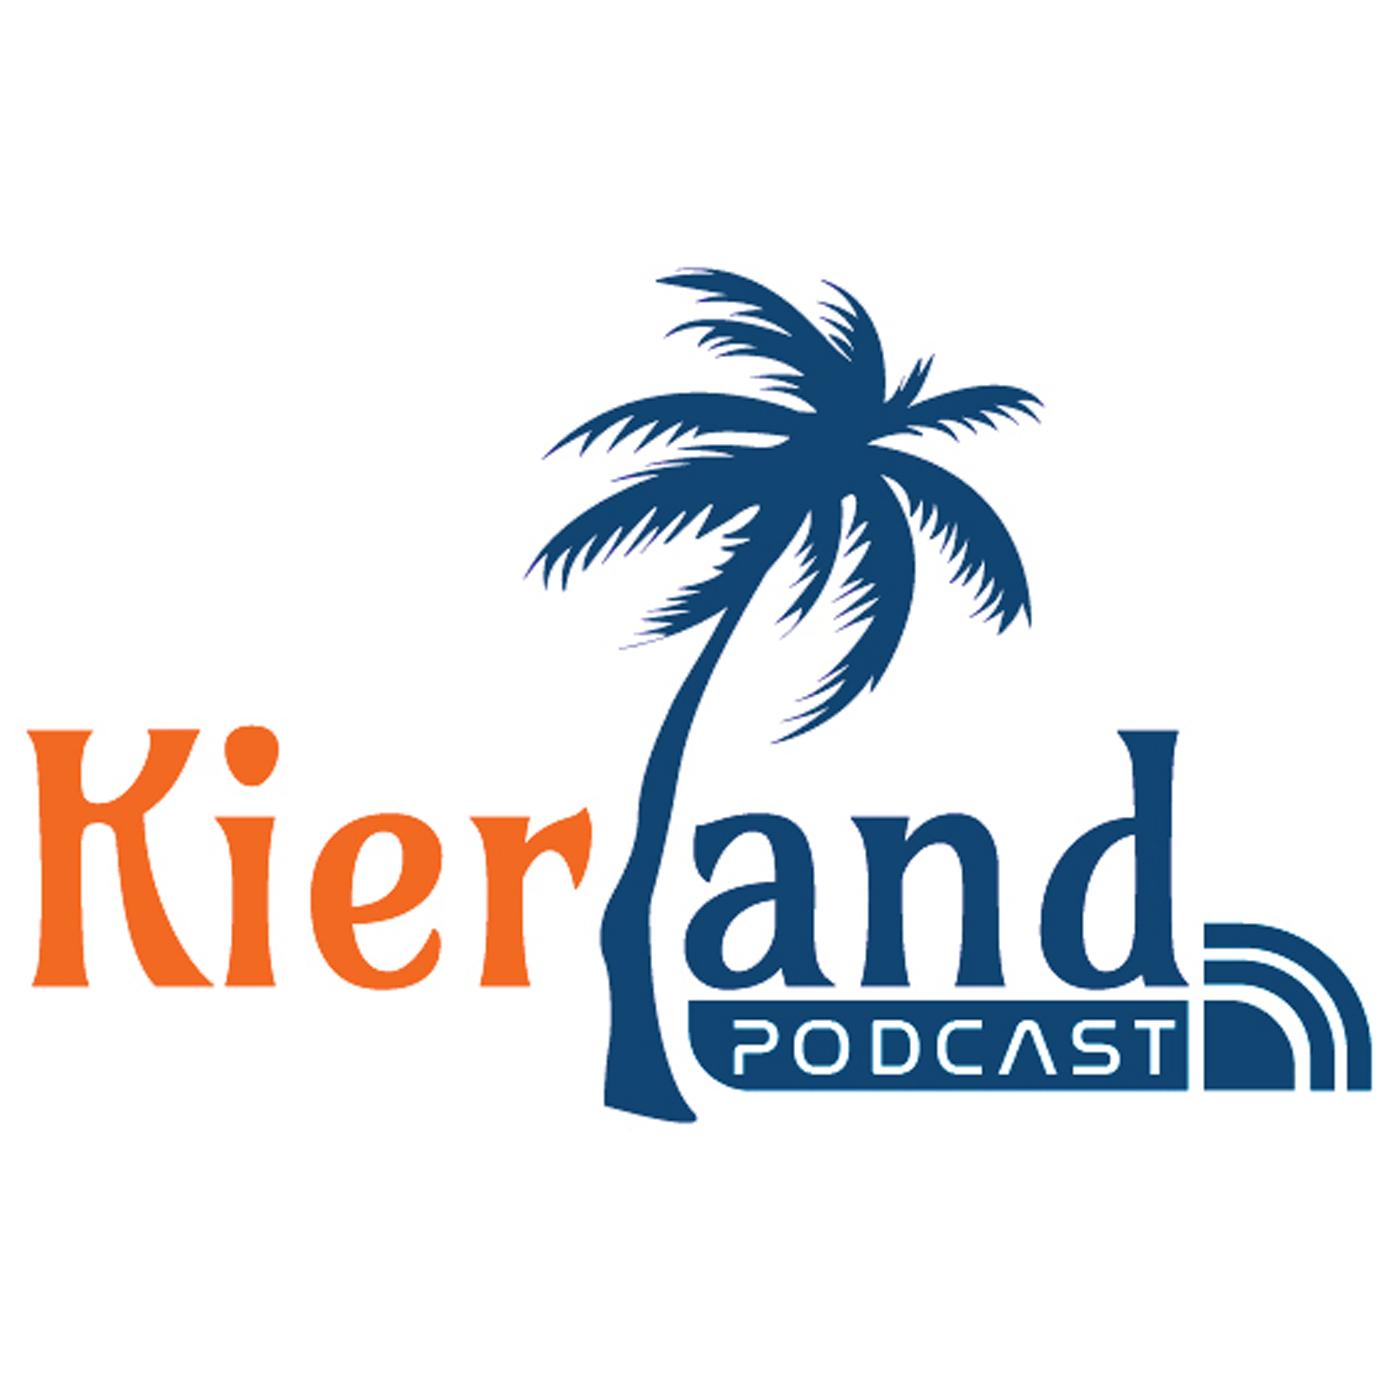 Kierland1400x1400.png